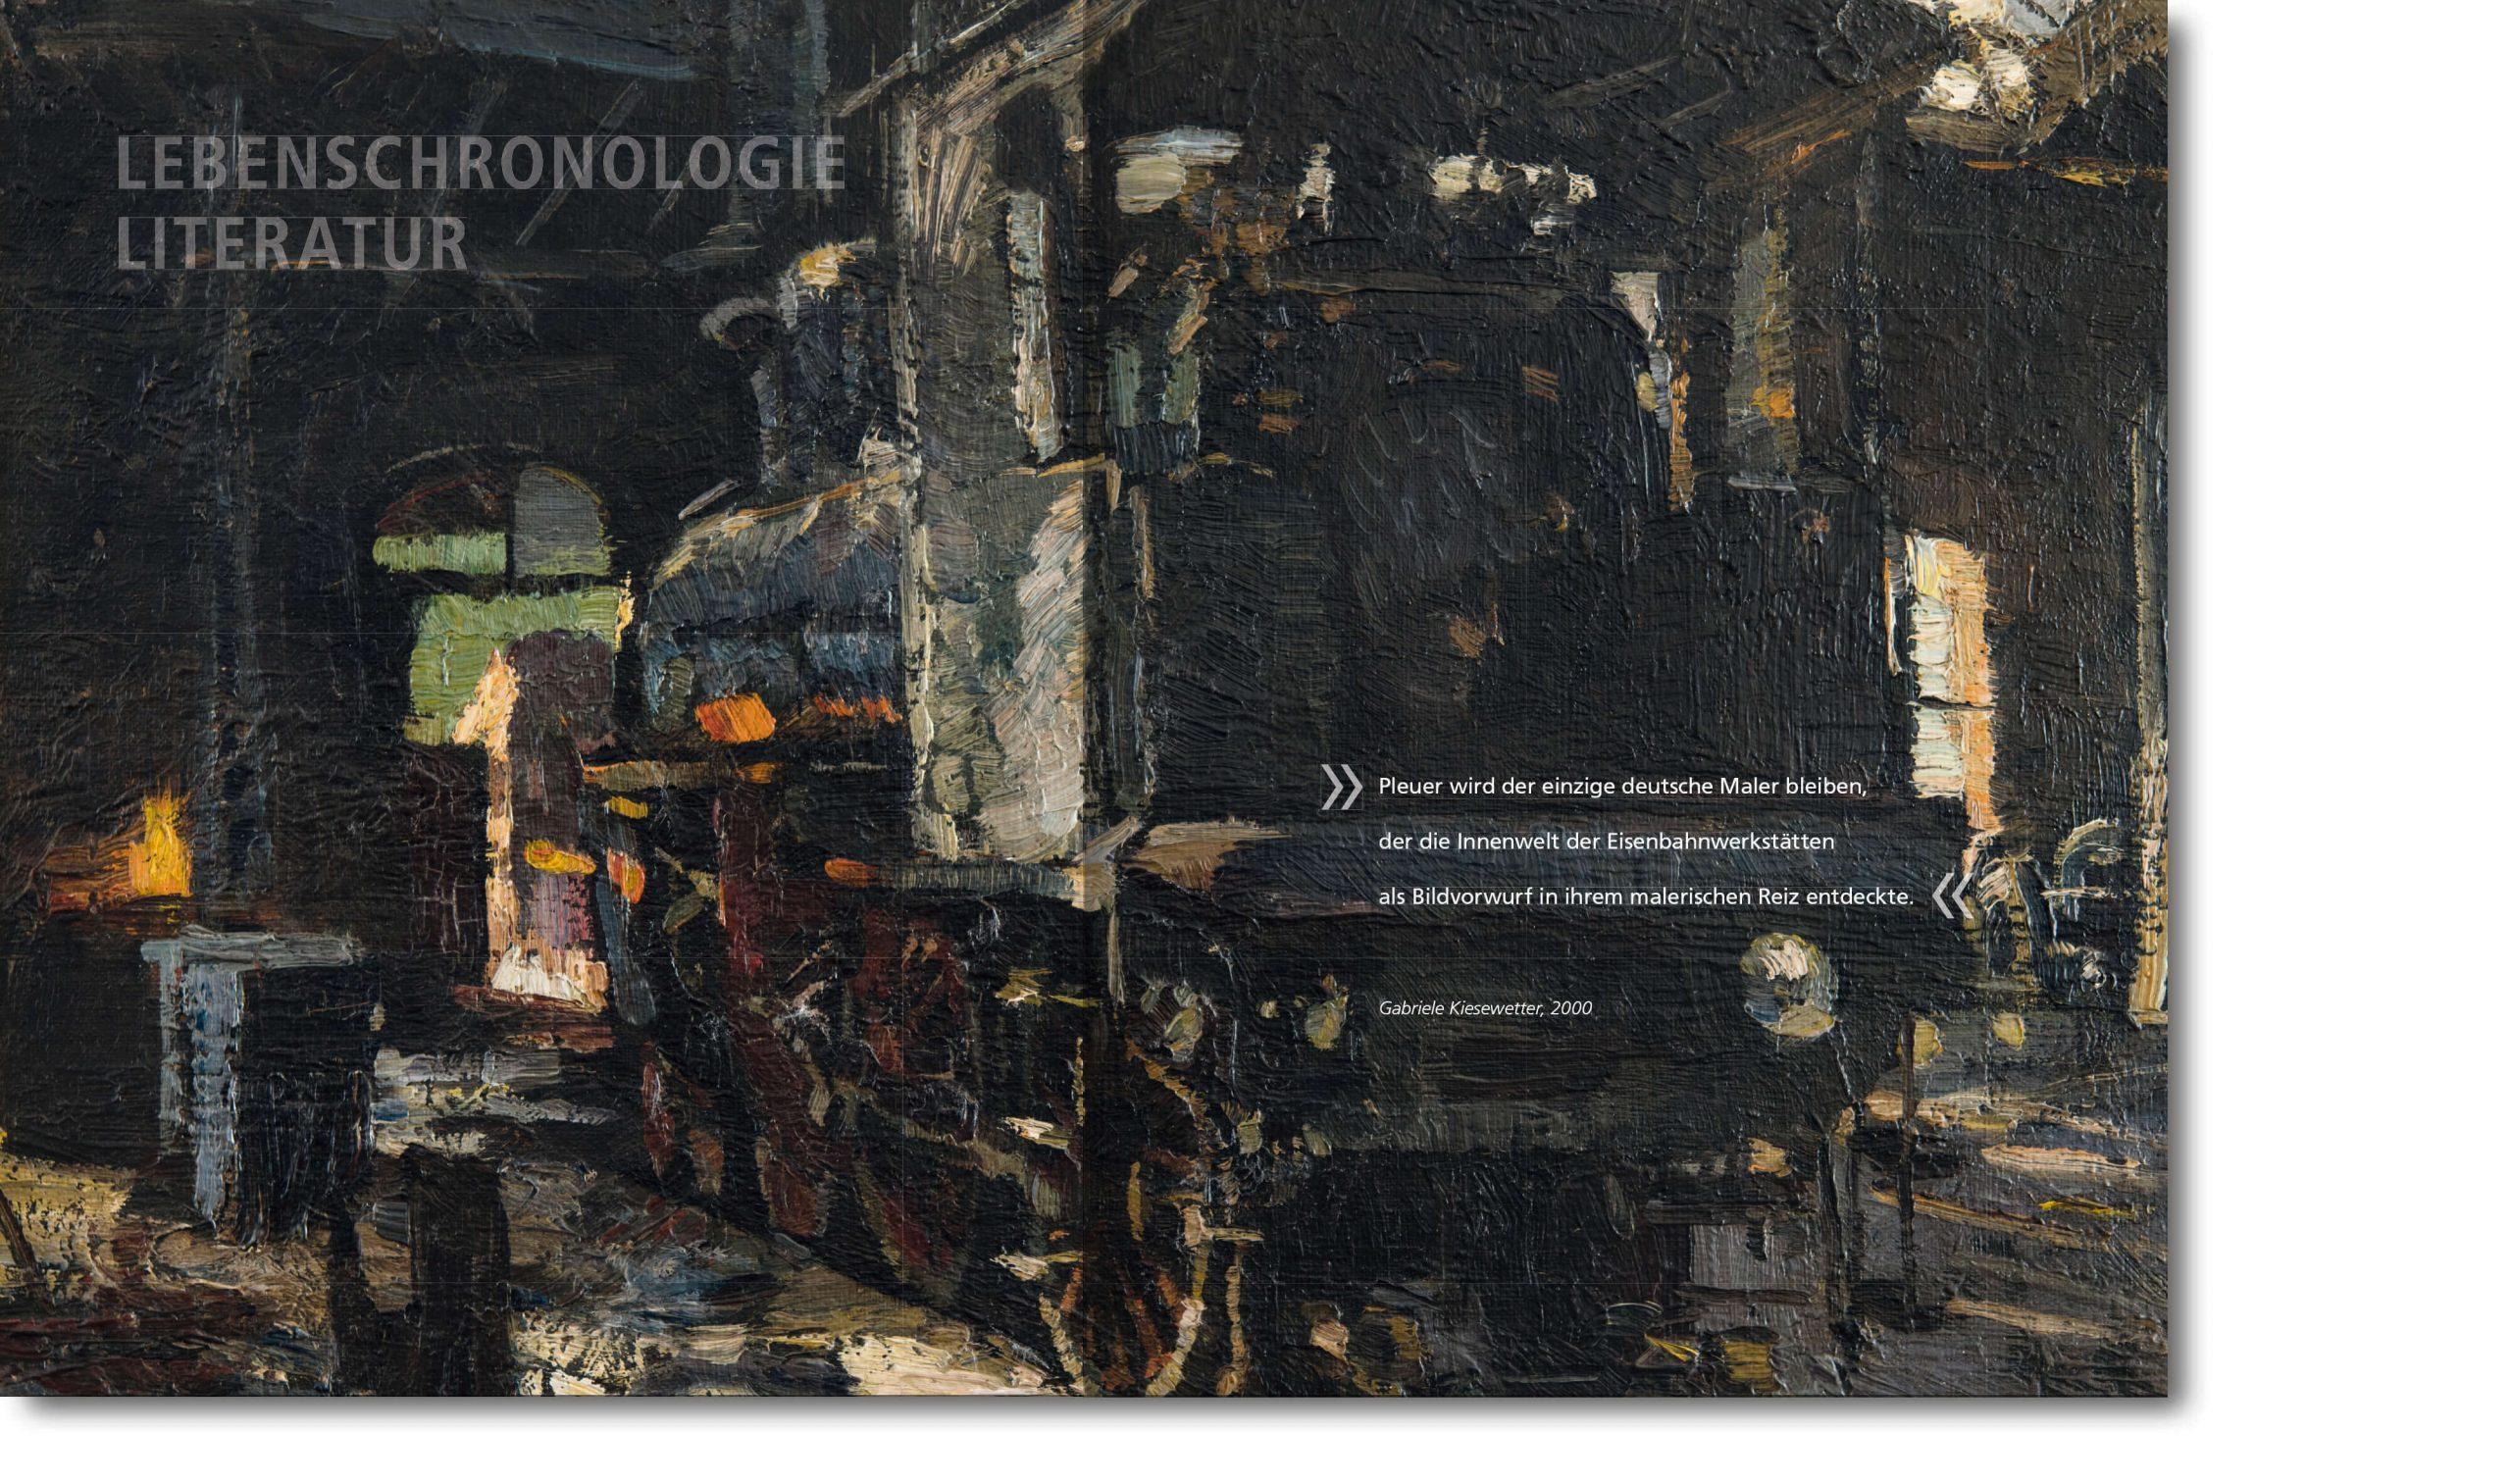 fh-web-katalog-pleuer-6-scaled.jpg